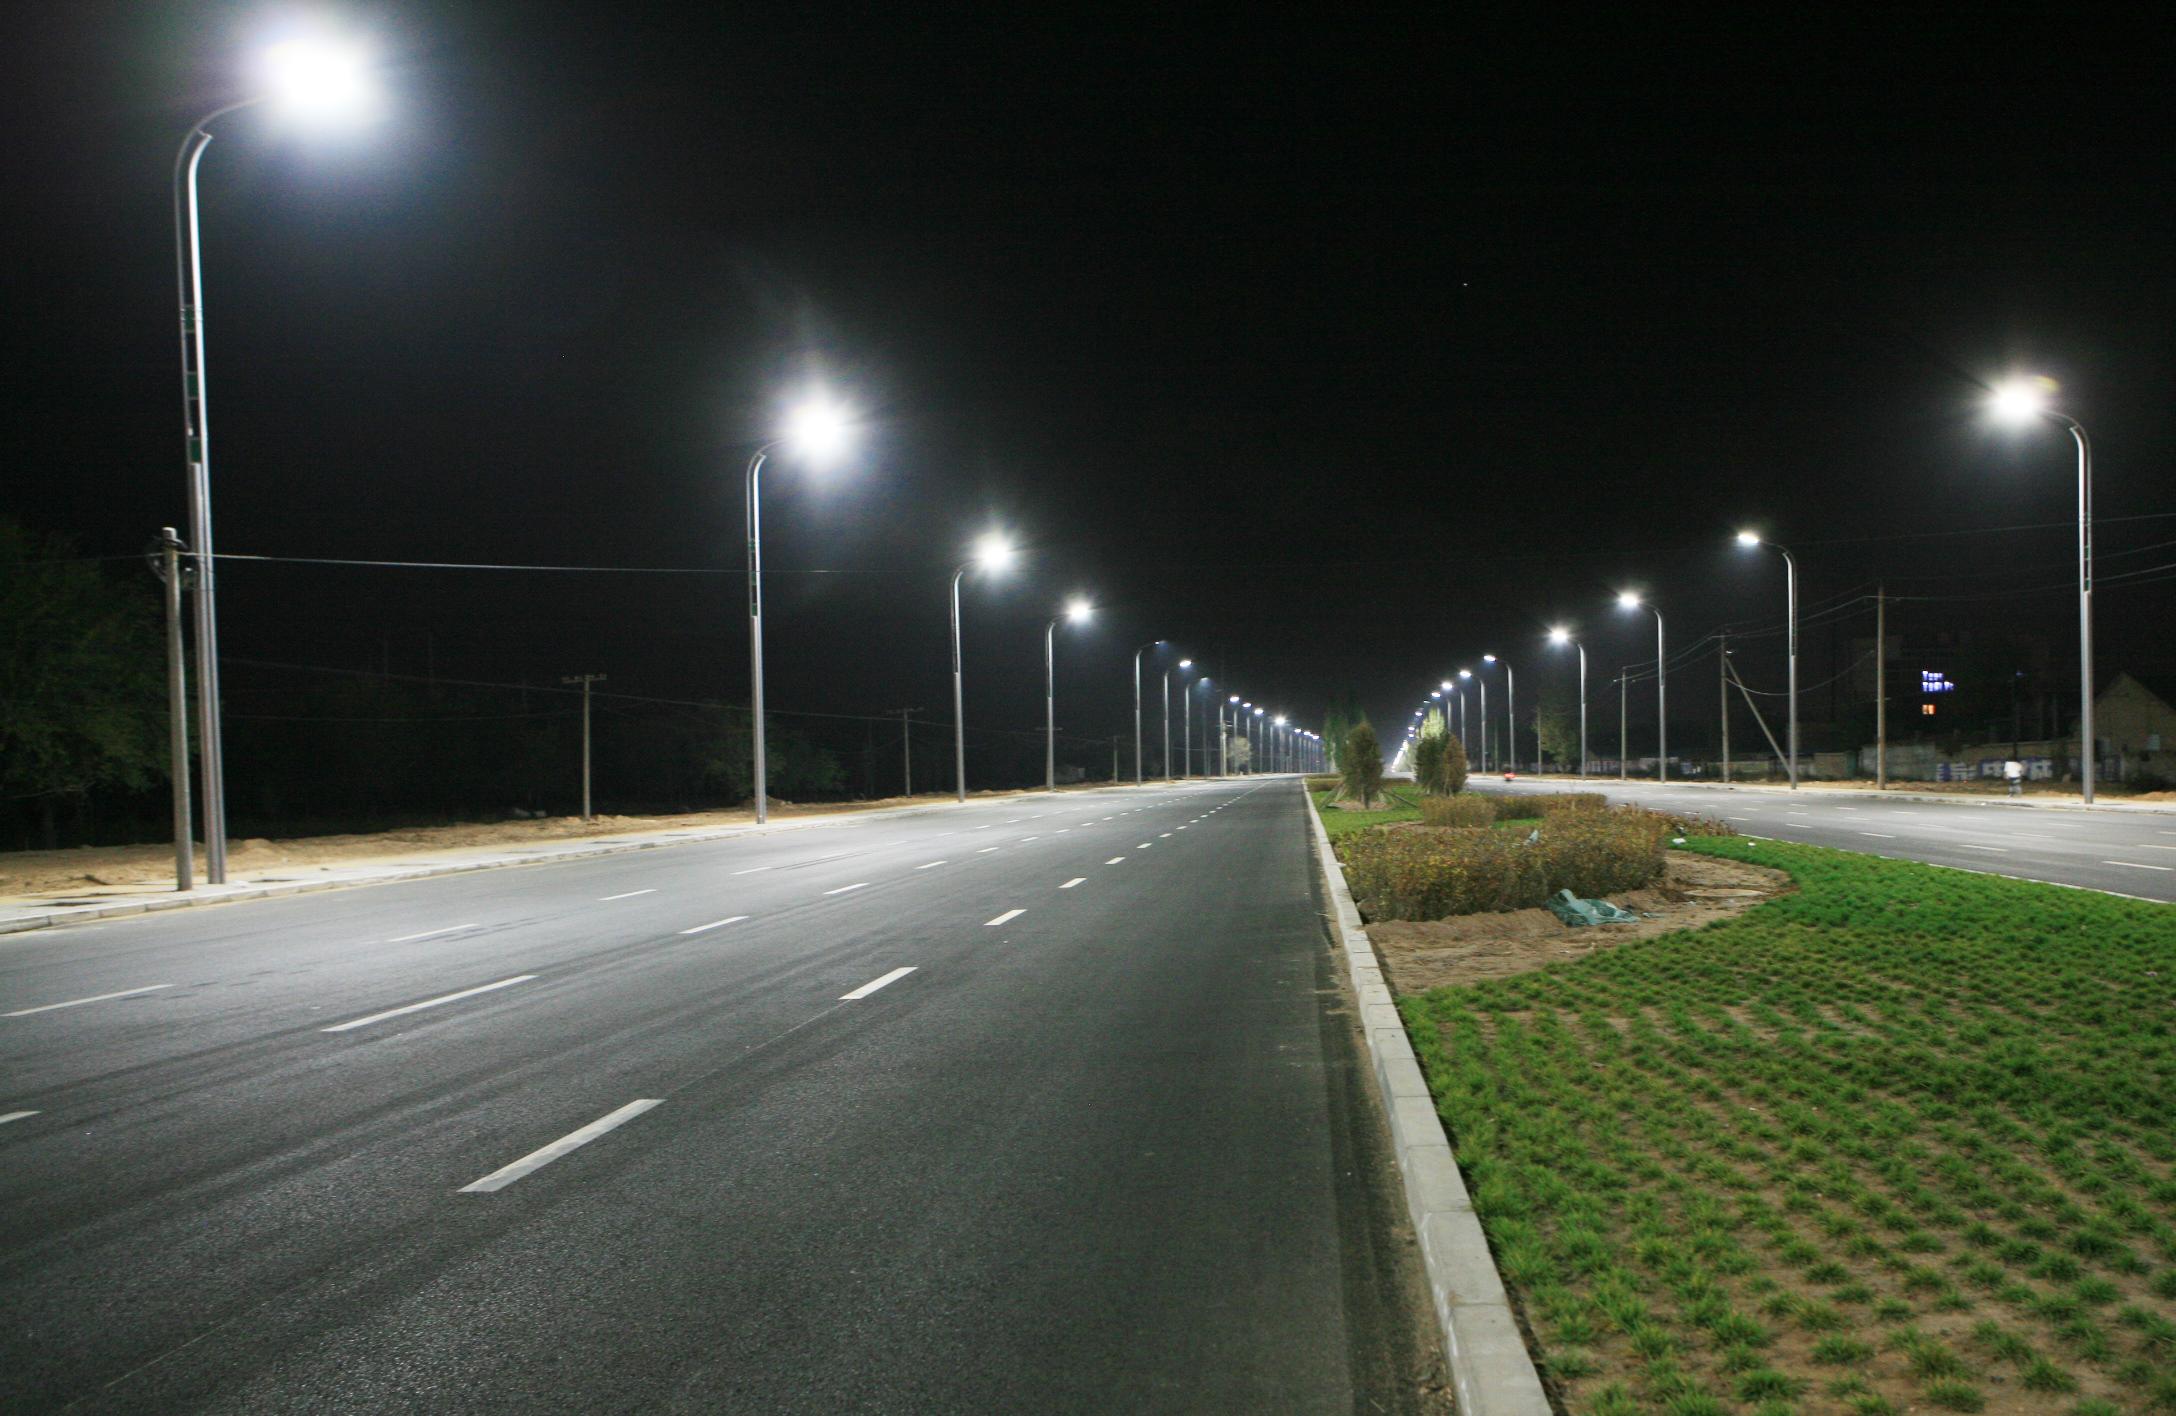 street lamps photo - 1